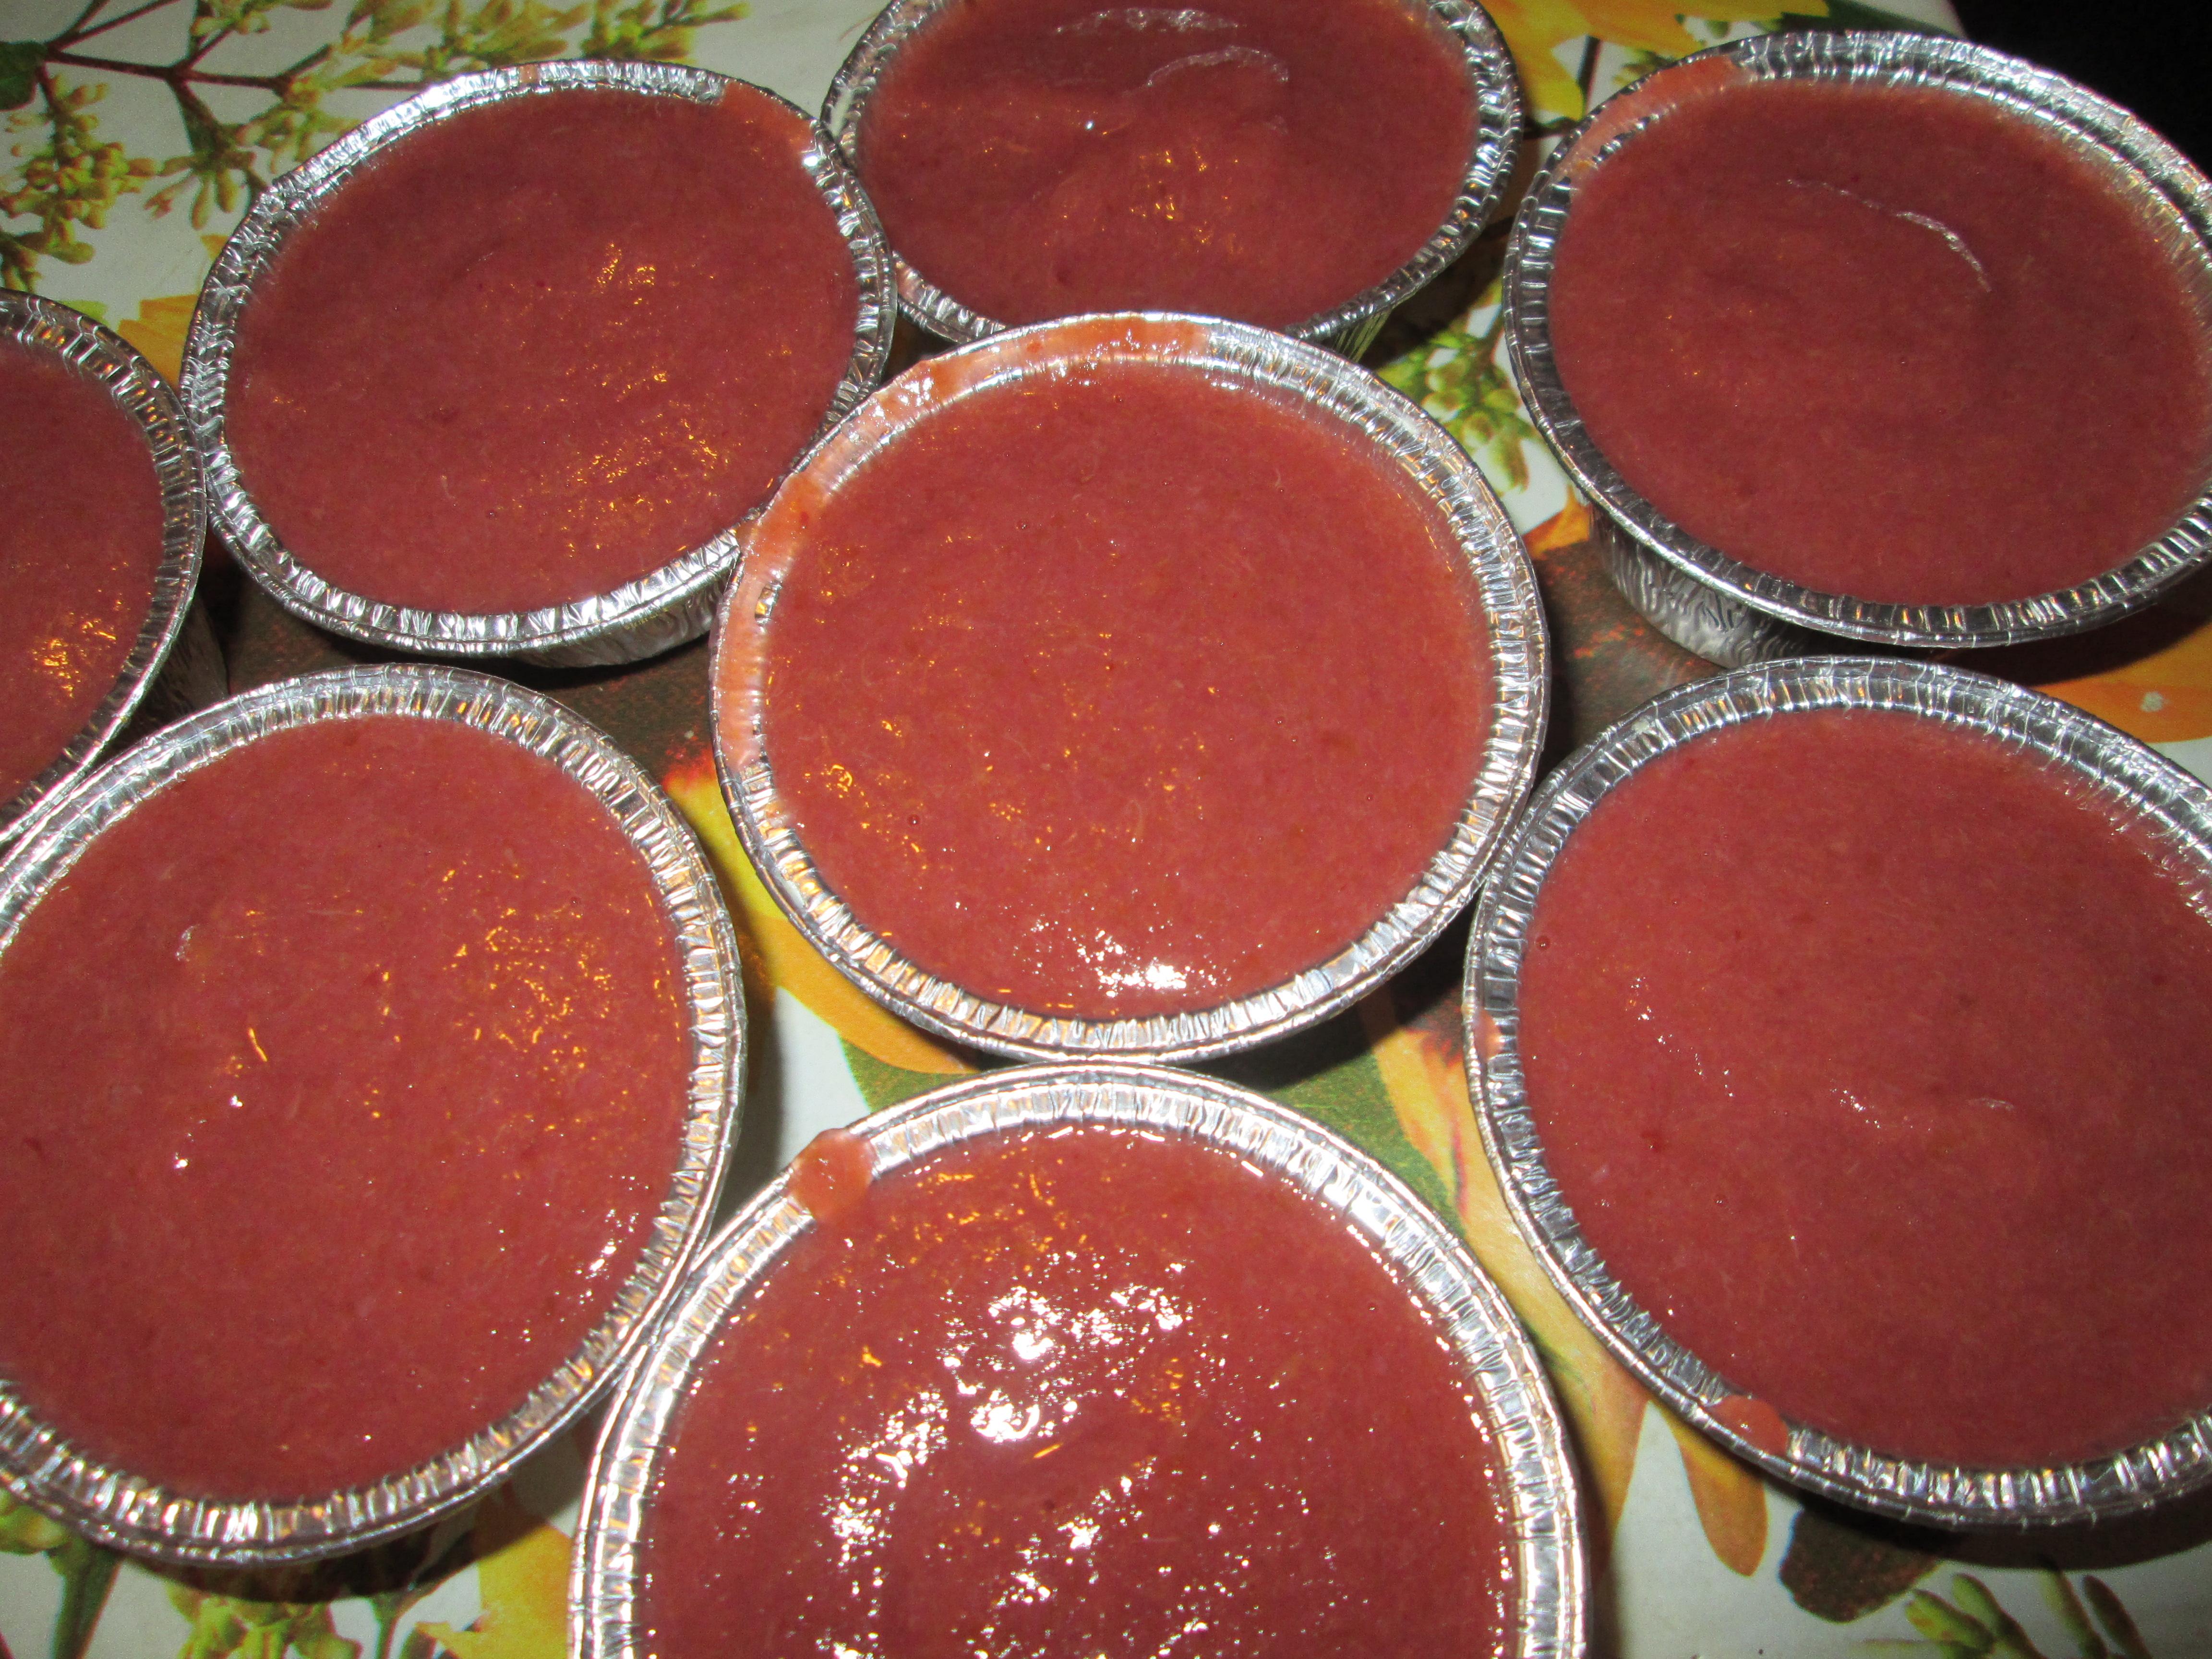 Cucina Per Bambini Miele : Classe matrice per i bambini sui biscotti di natale di cottura